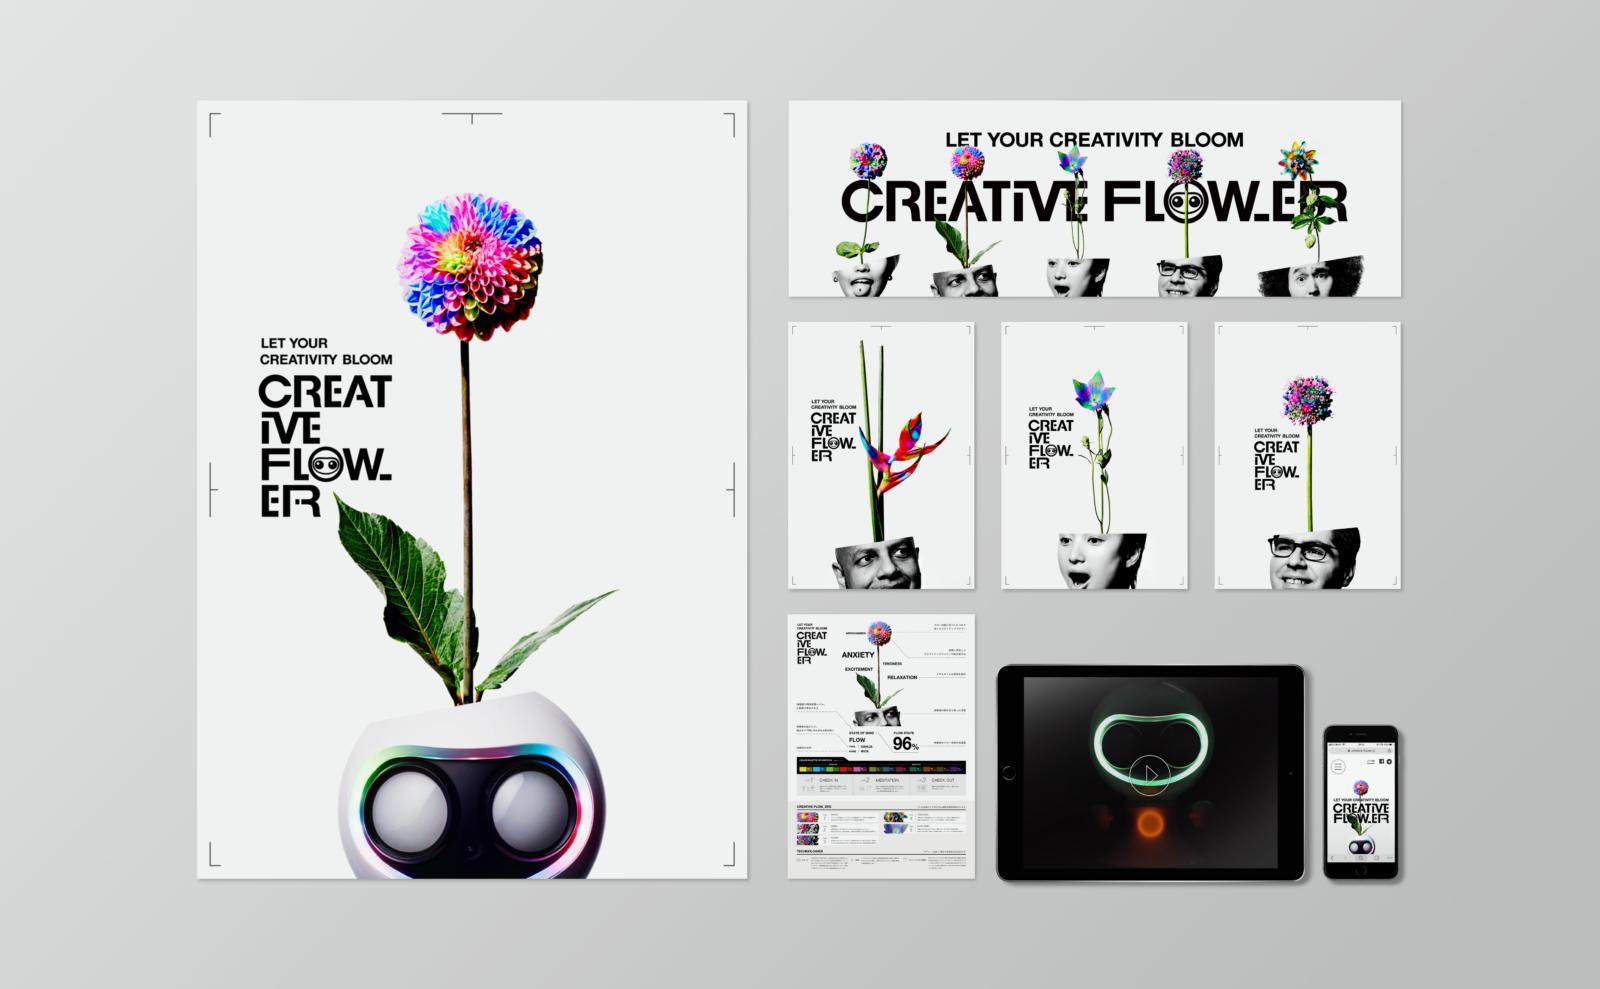 CREATIVE FLOW_ER__-1